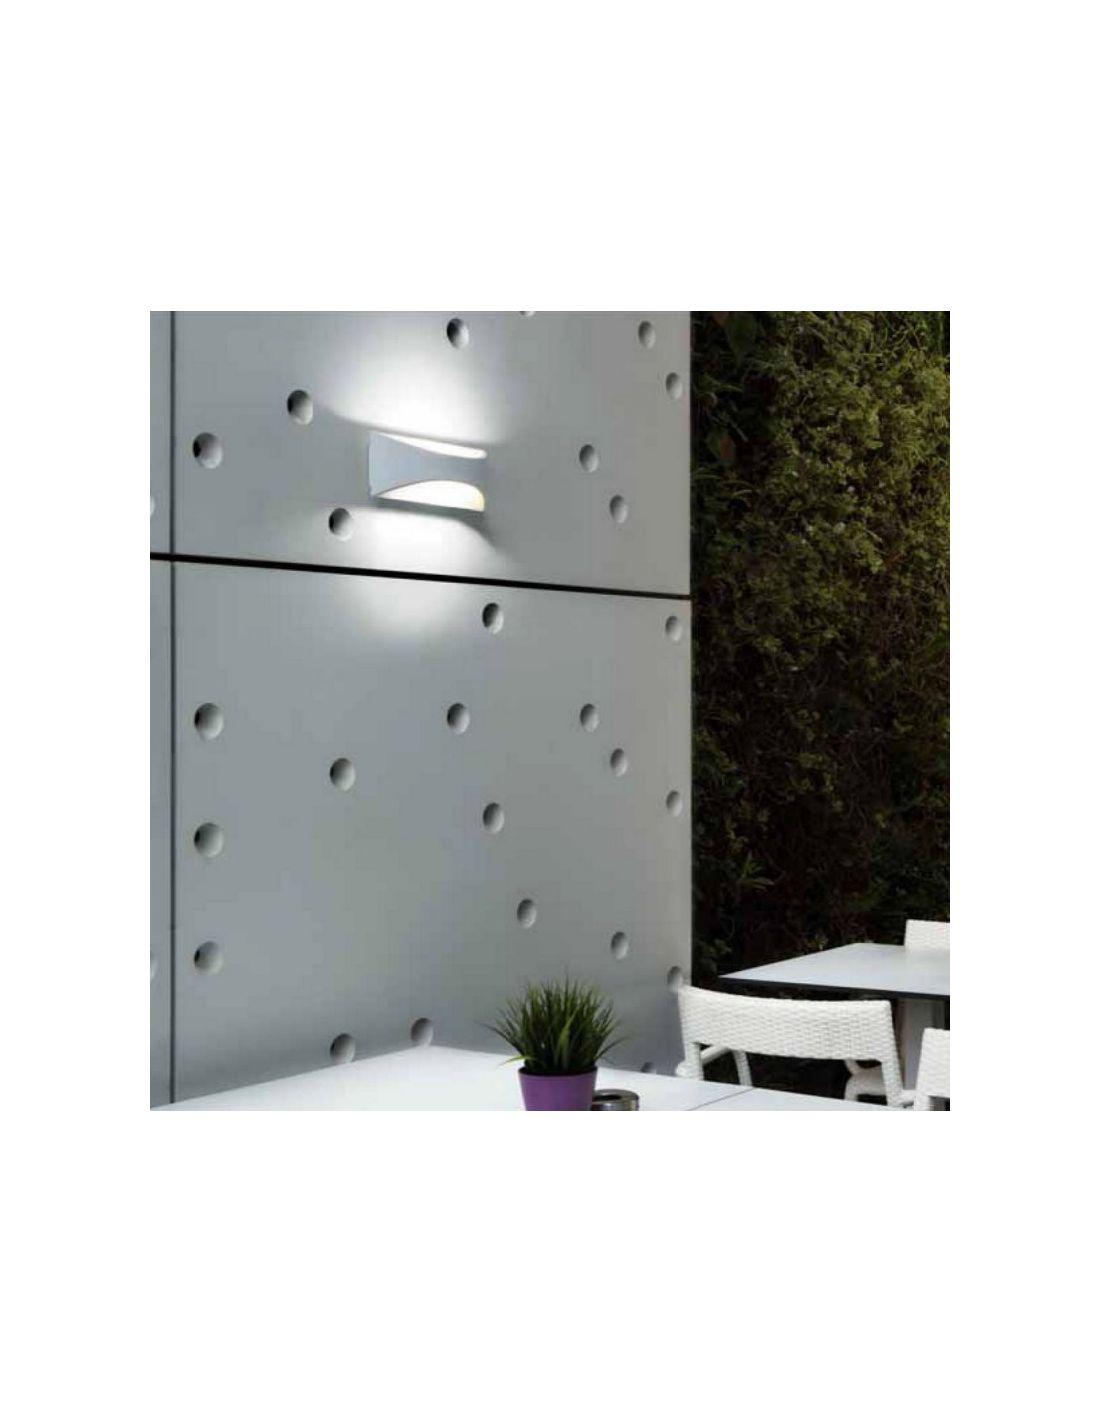 Aplique exterior exterior blanco env o r pido y seguro - Apliques exterior led ...